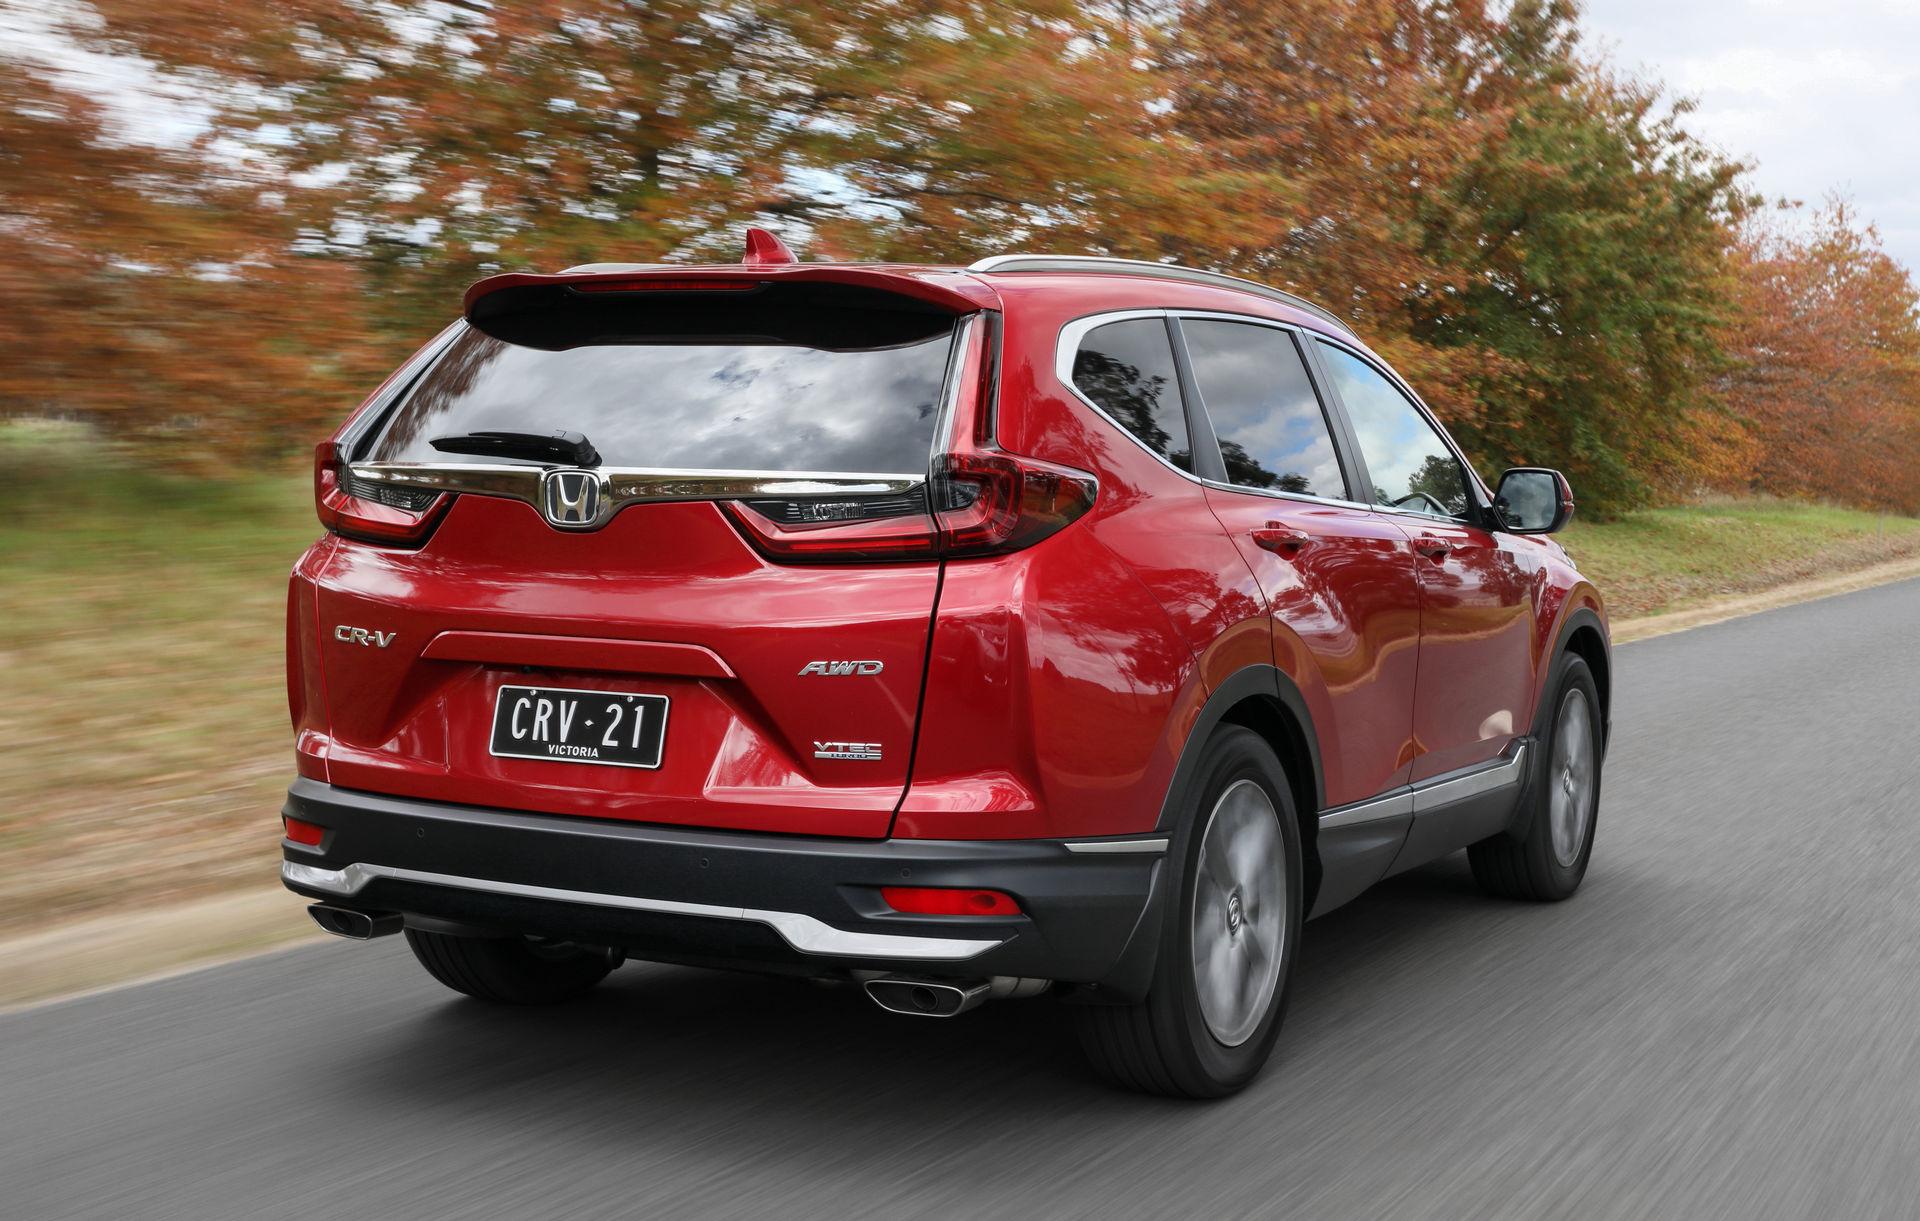 2021 Honda CR-V VTi-7, 1.5L 4cyl Petrol Turbocharged